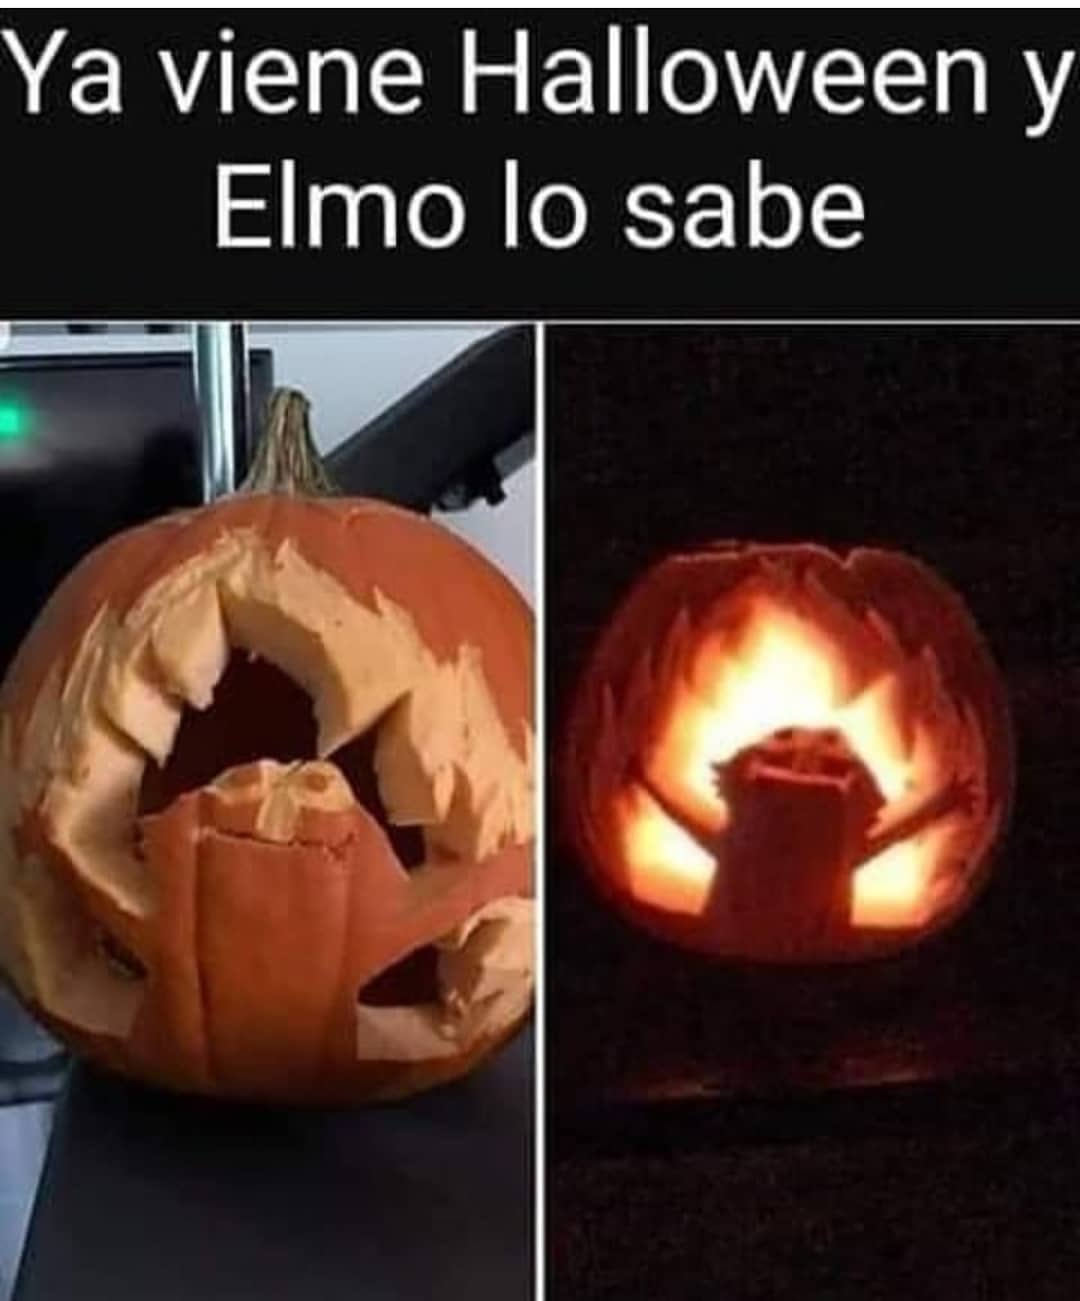 Ya viene Halloween y Elmo lo sabe.